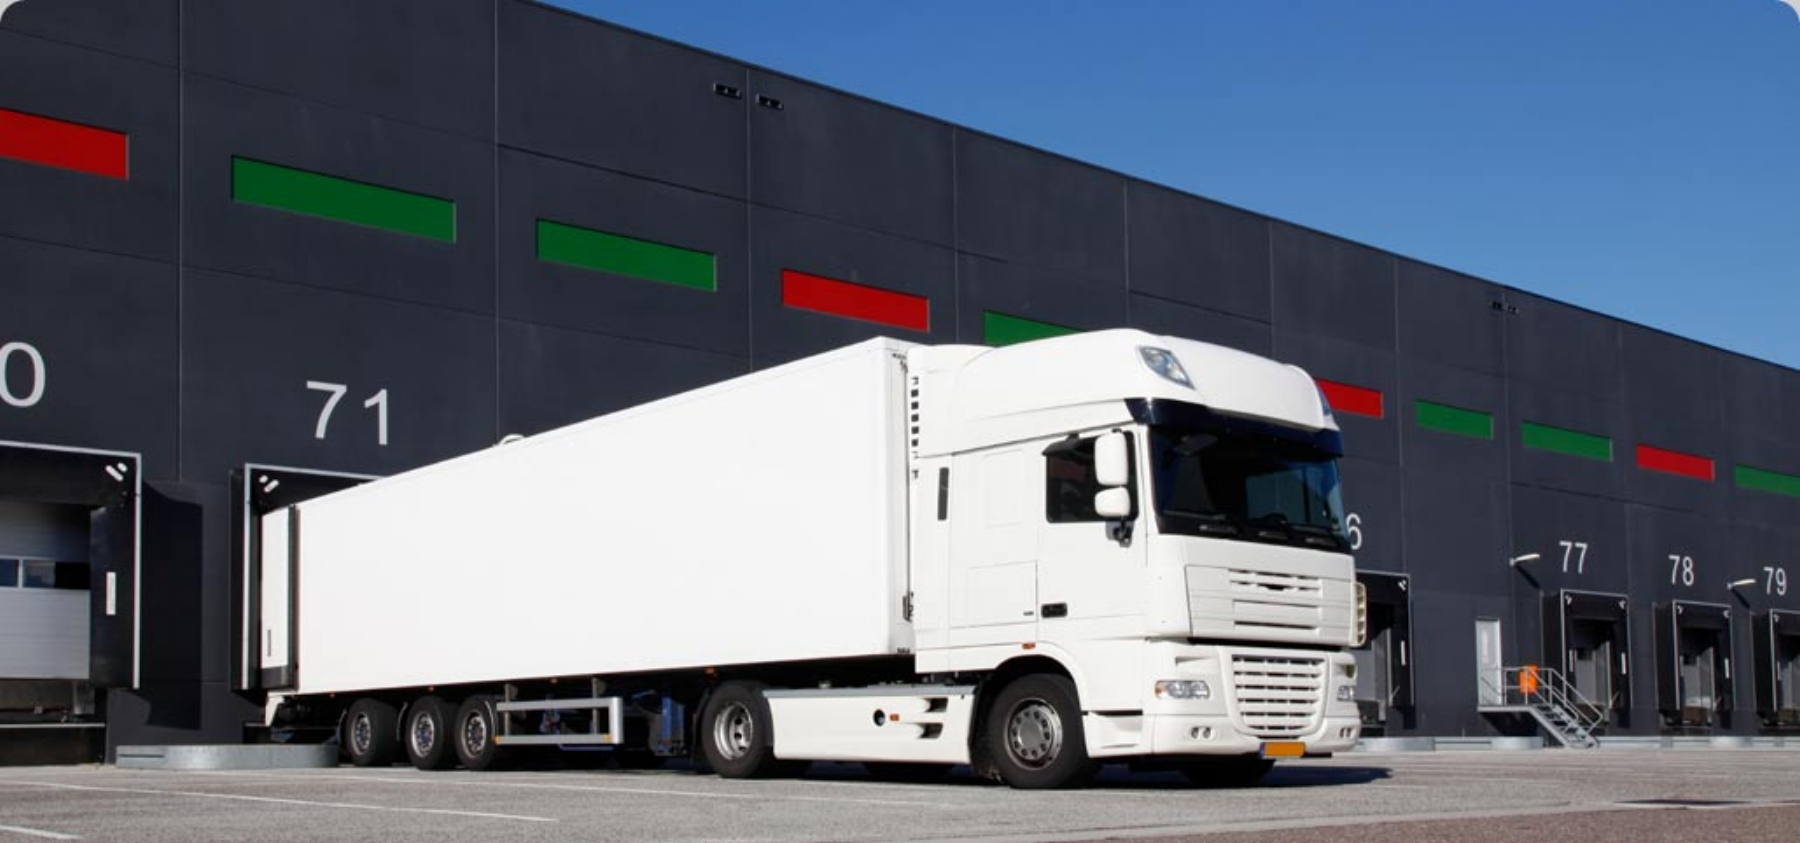 2014.07.29-Northern_Gateway-NGIPImage_Truck Depot.jpg